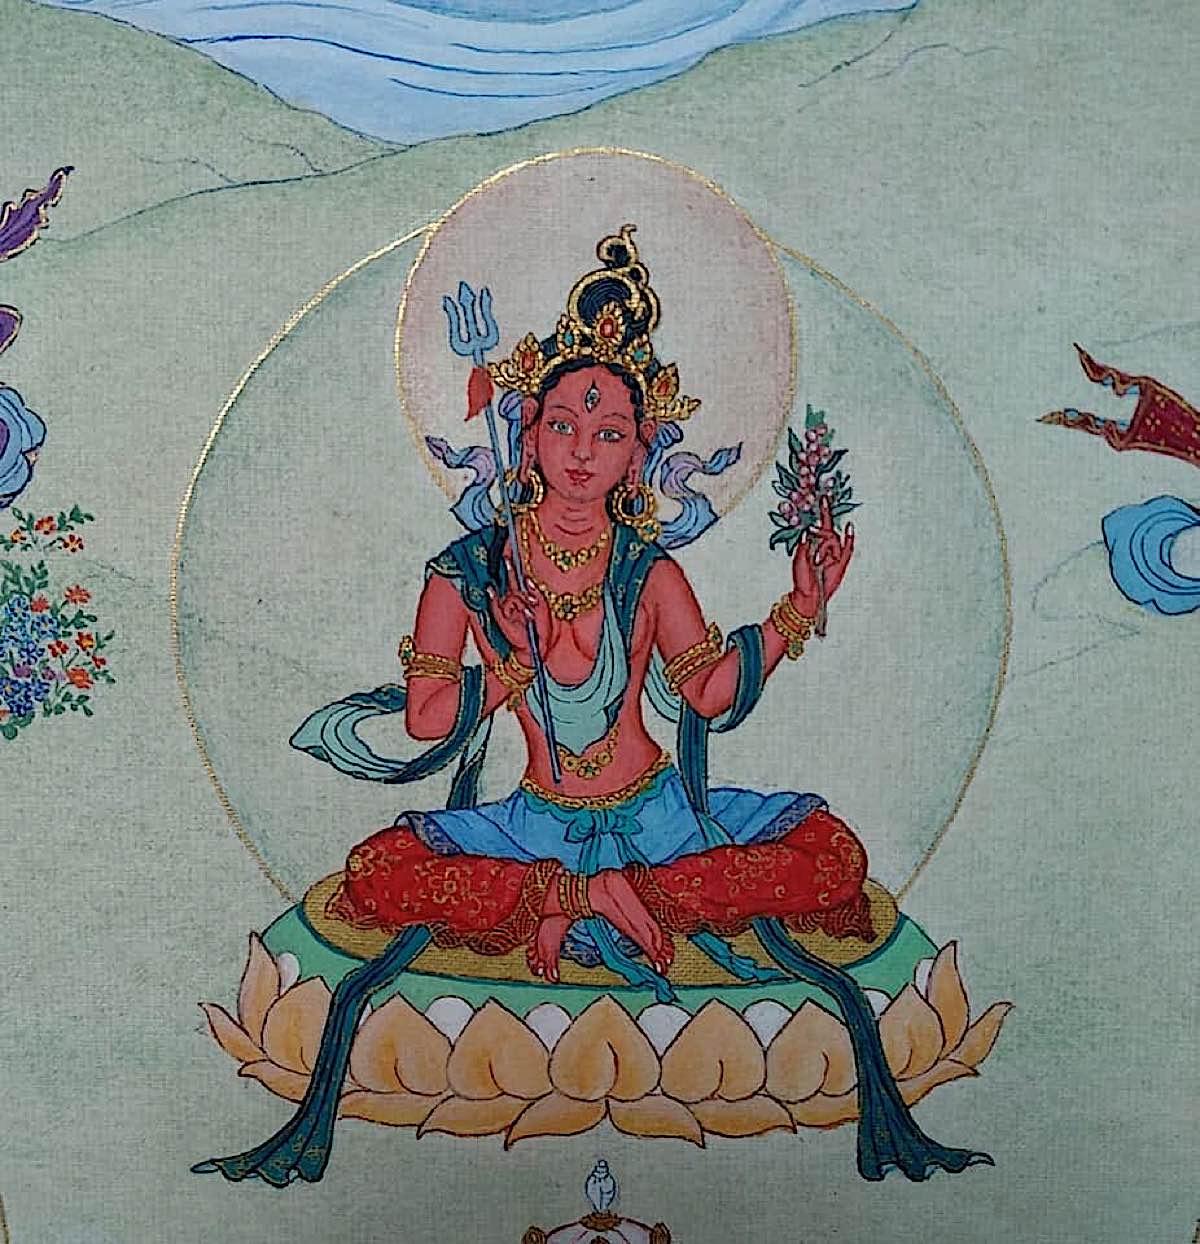 Buddha Weekly 16 Tara Destroyer of All Attachment Raga Nisundana Tara 21 Taras Thankha by Angeli Lhadripa Shkonda Buddhism